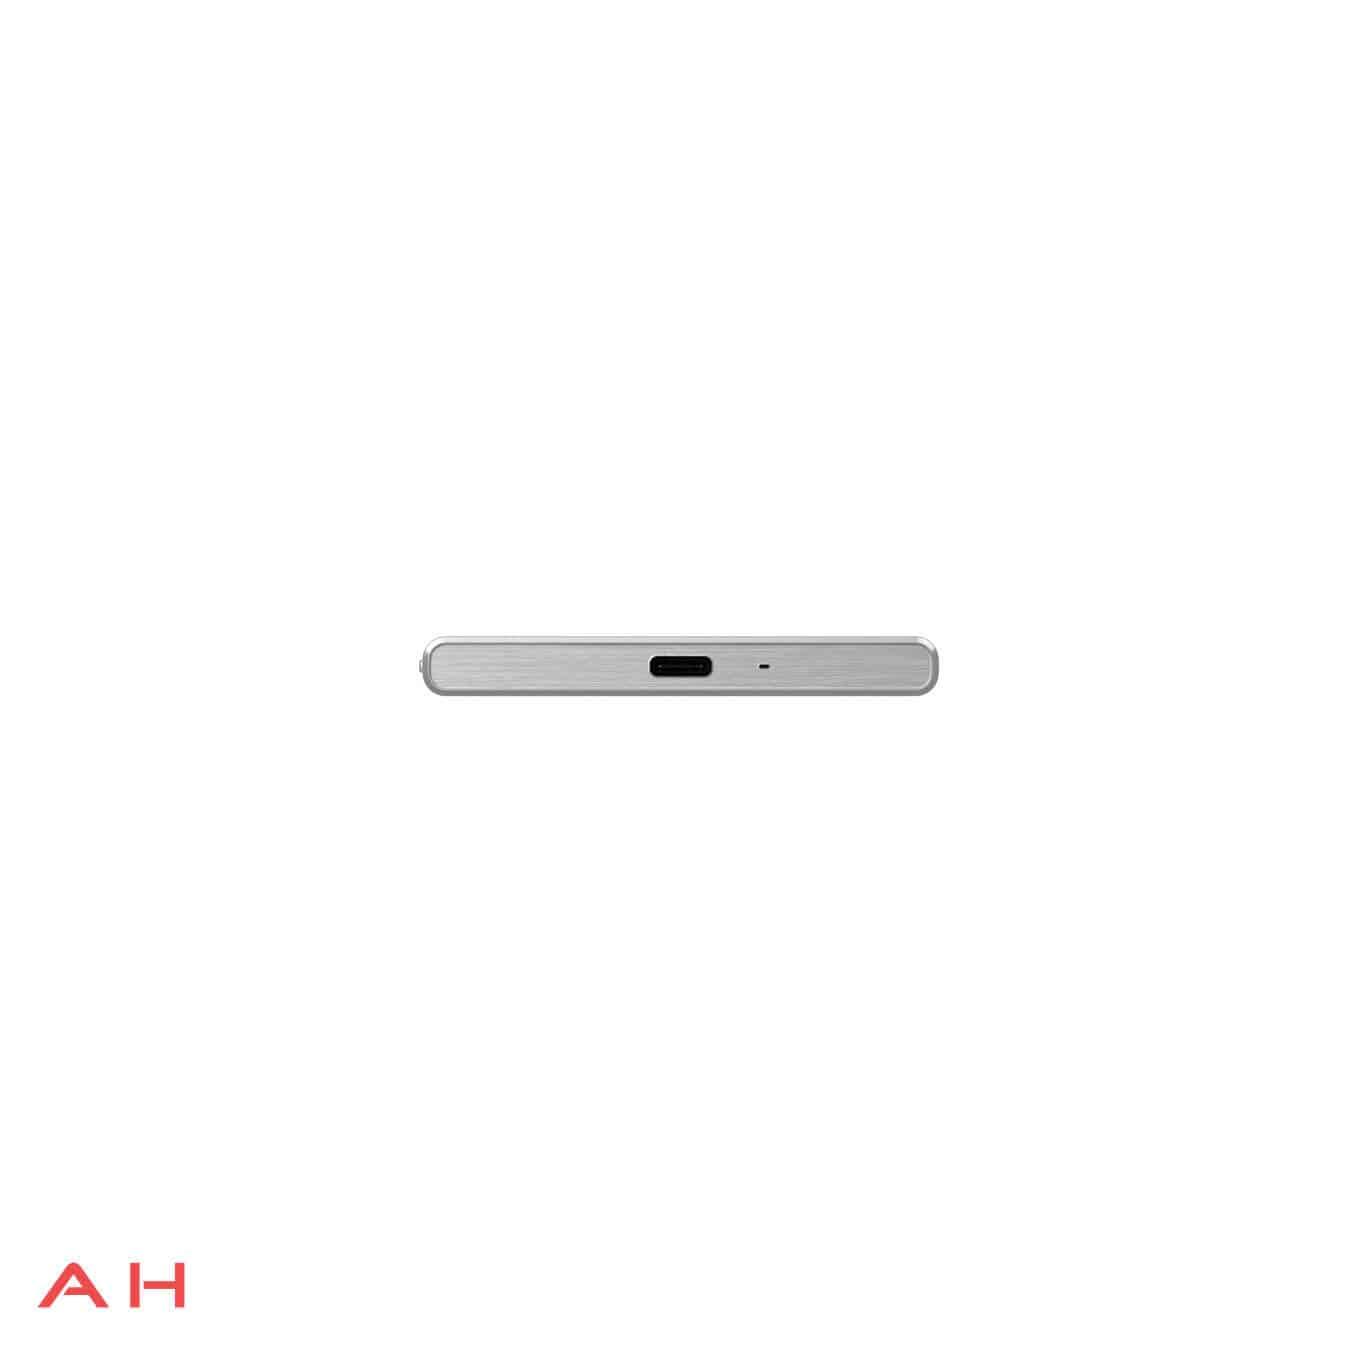 Sony Xperia XZ AH 4